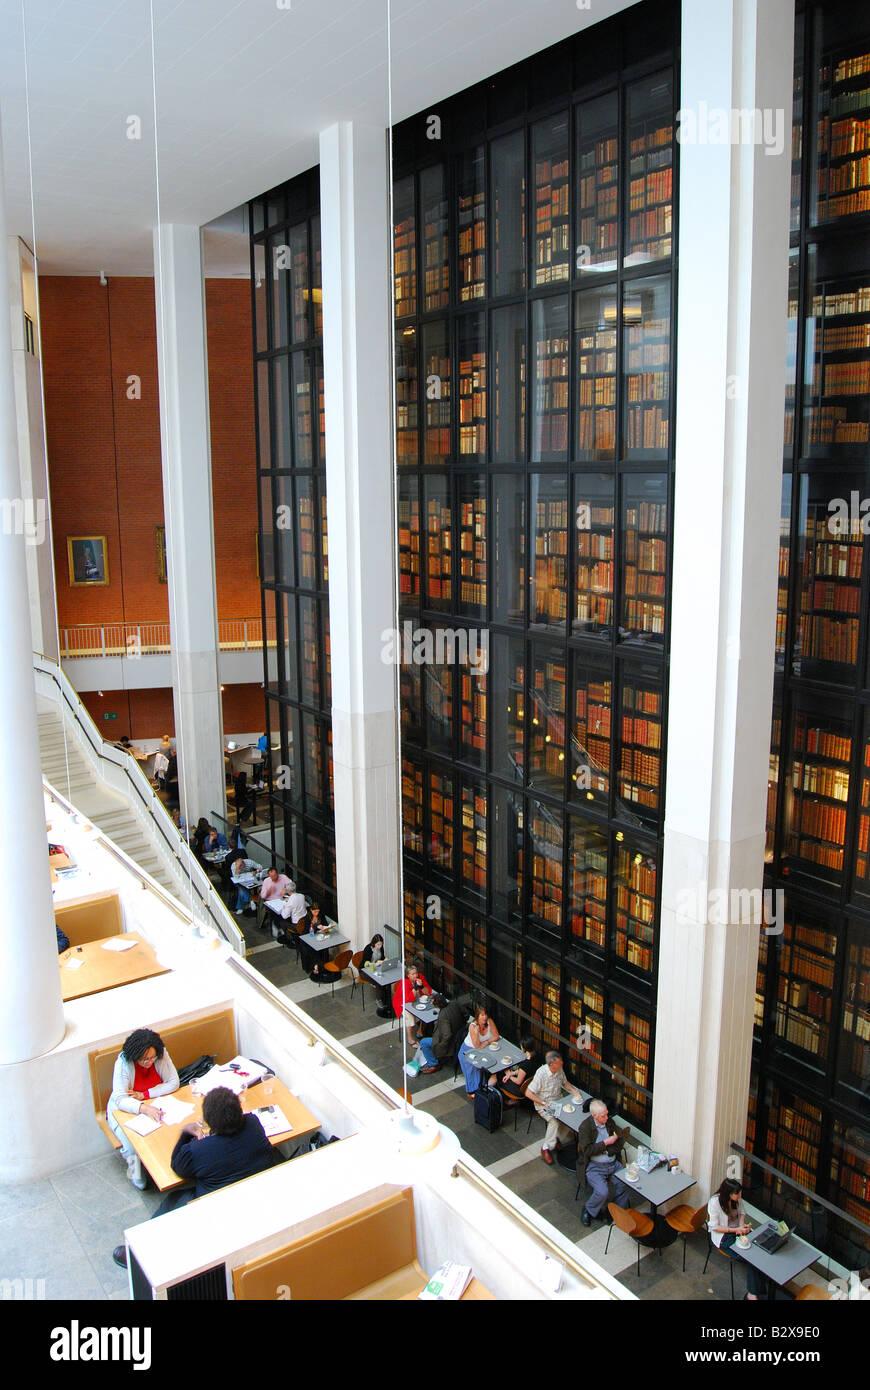 Interior View Showing Kings Library British Euston Road Camden Borough London England United Kingdom